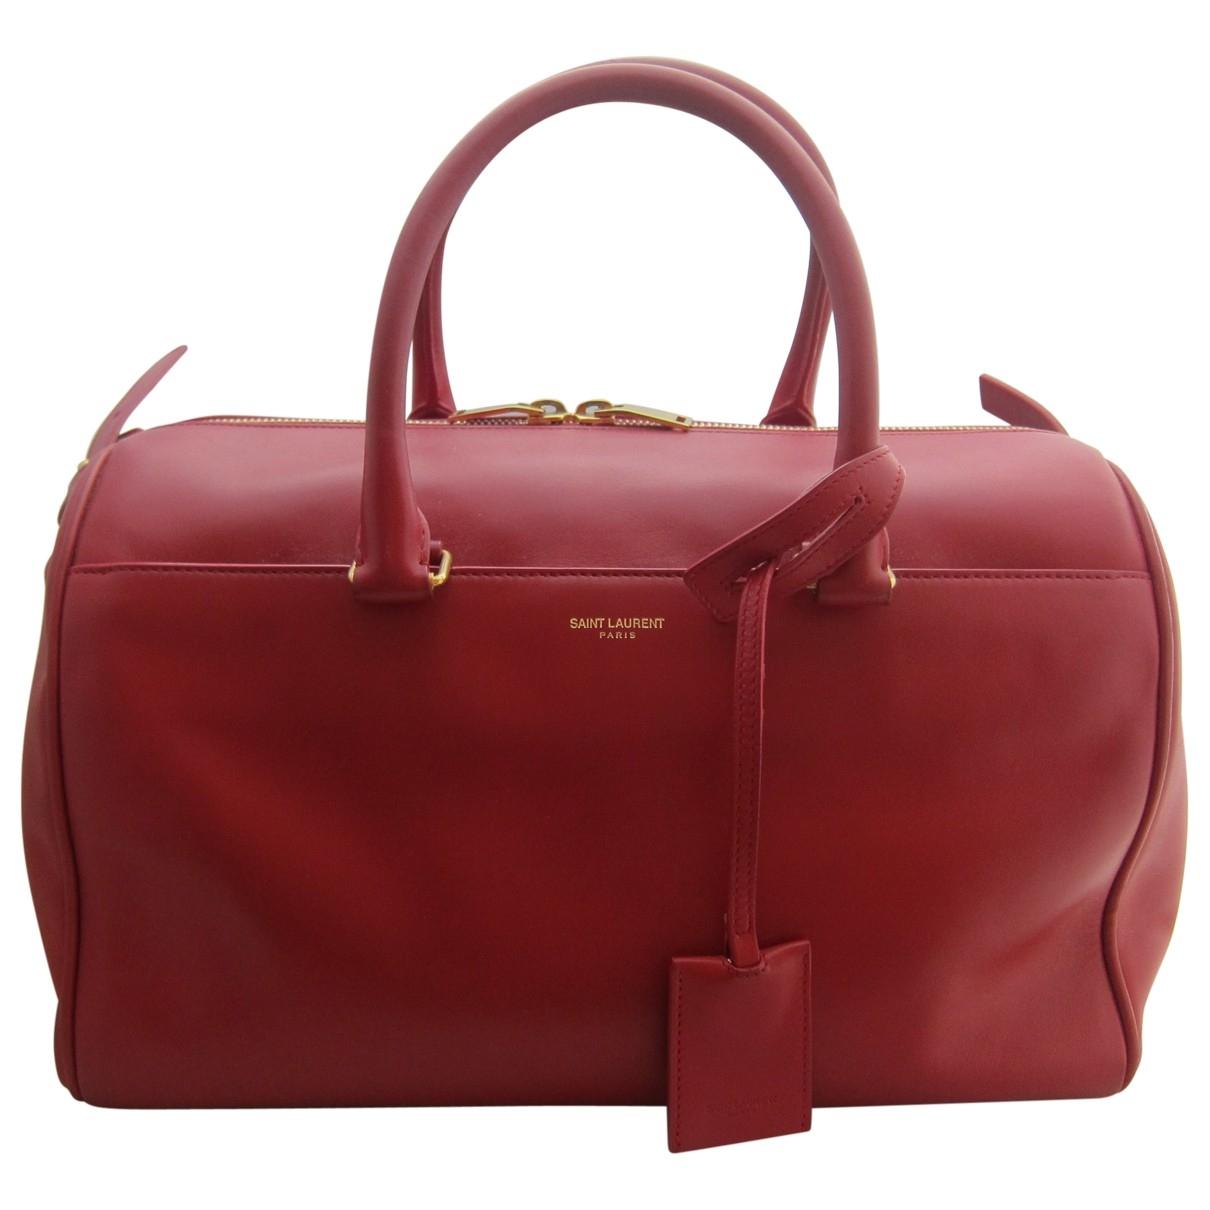 Saint Laurent Duffle Red Leather handbag for Women \N